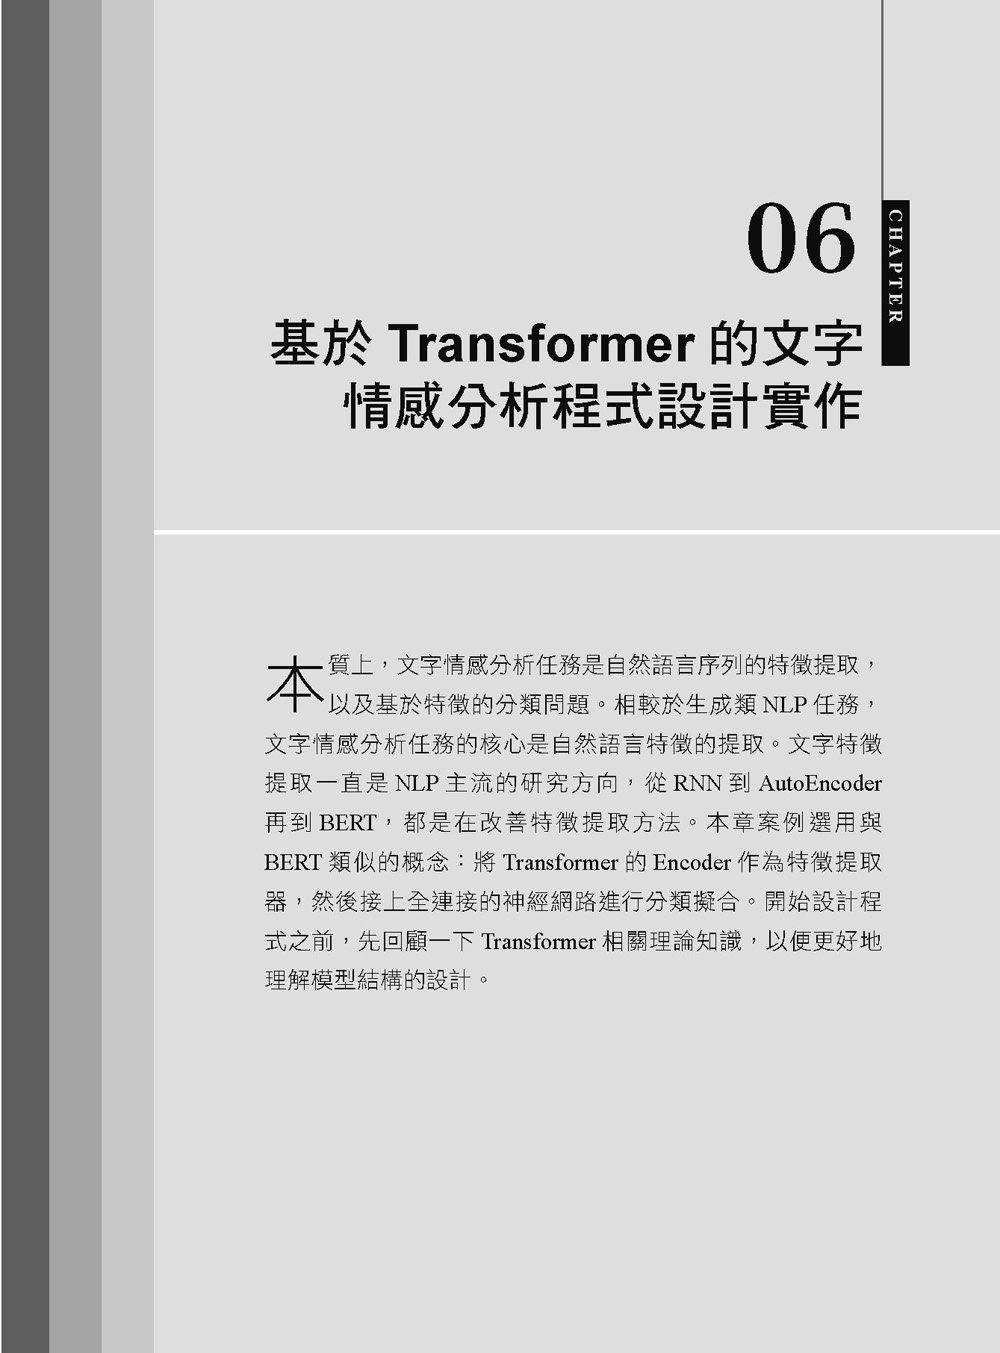 TensorFlow 2.0 深度學習快速入門:從1到2快人一步,從0到2一步到位-preview-1